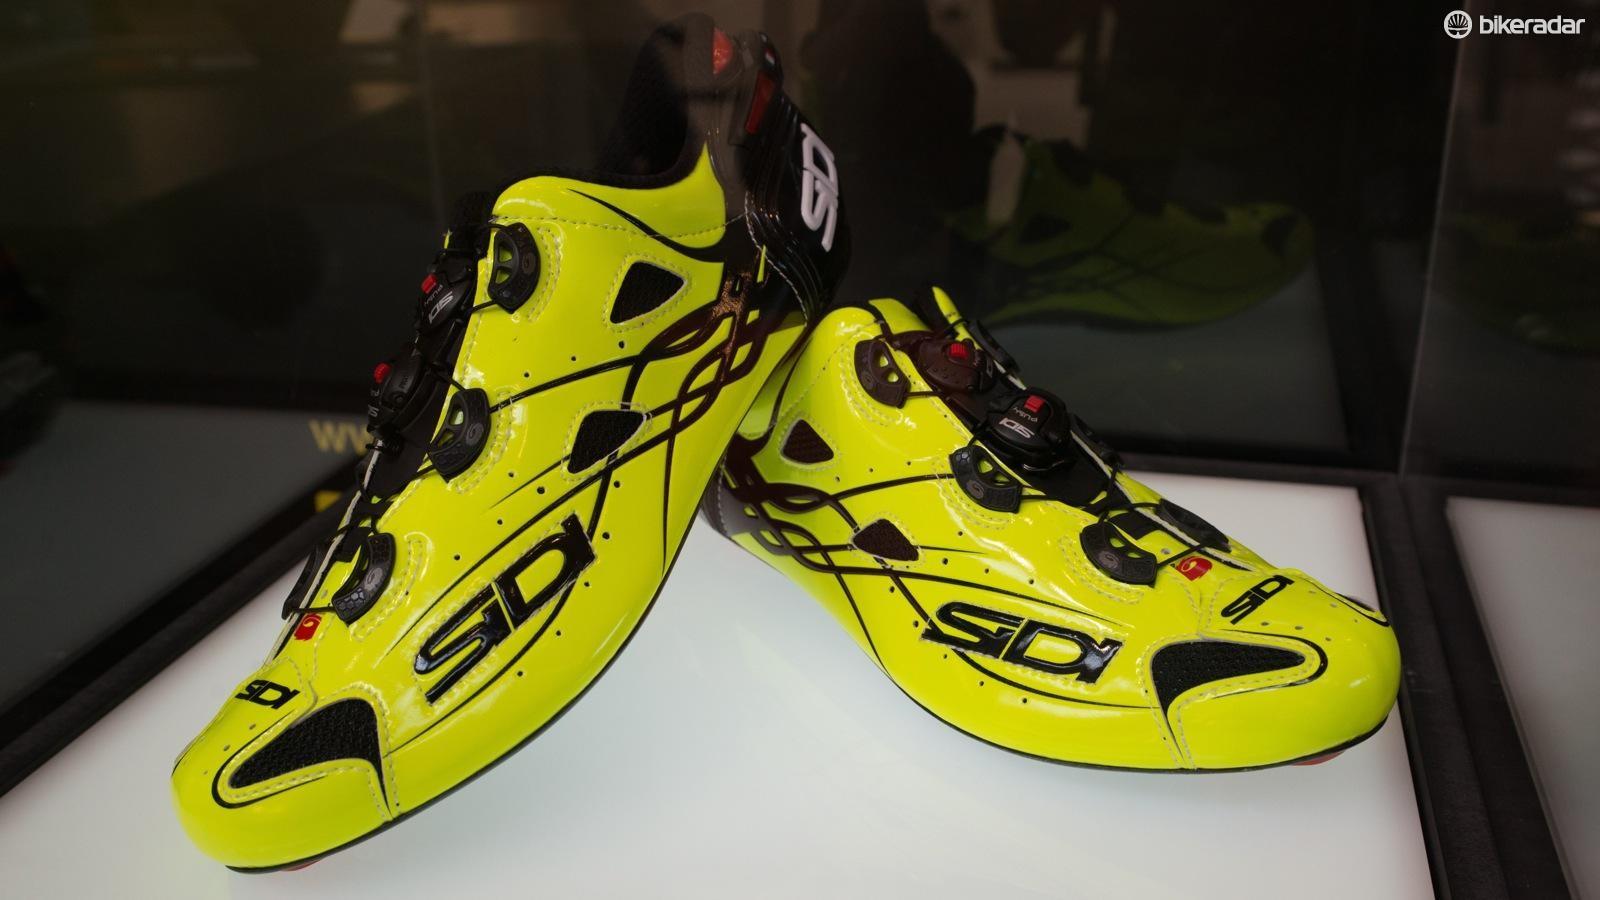 shoes32-1473464696562-12n330oarb0ao-1478535716616-1trstlp849fs5-fd1a275